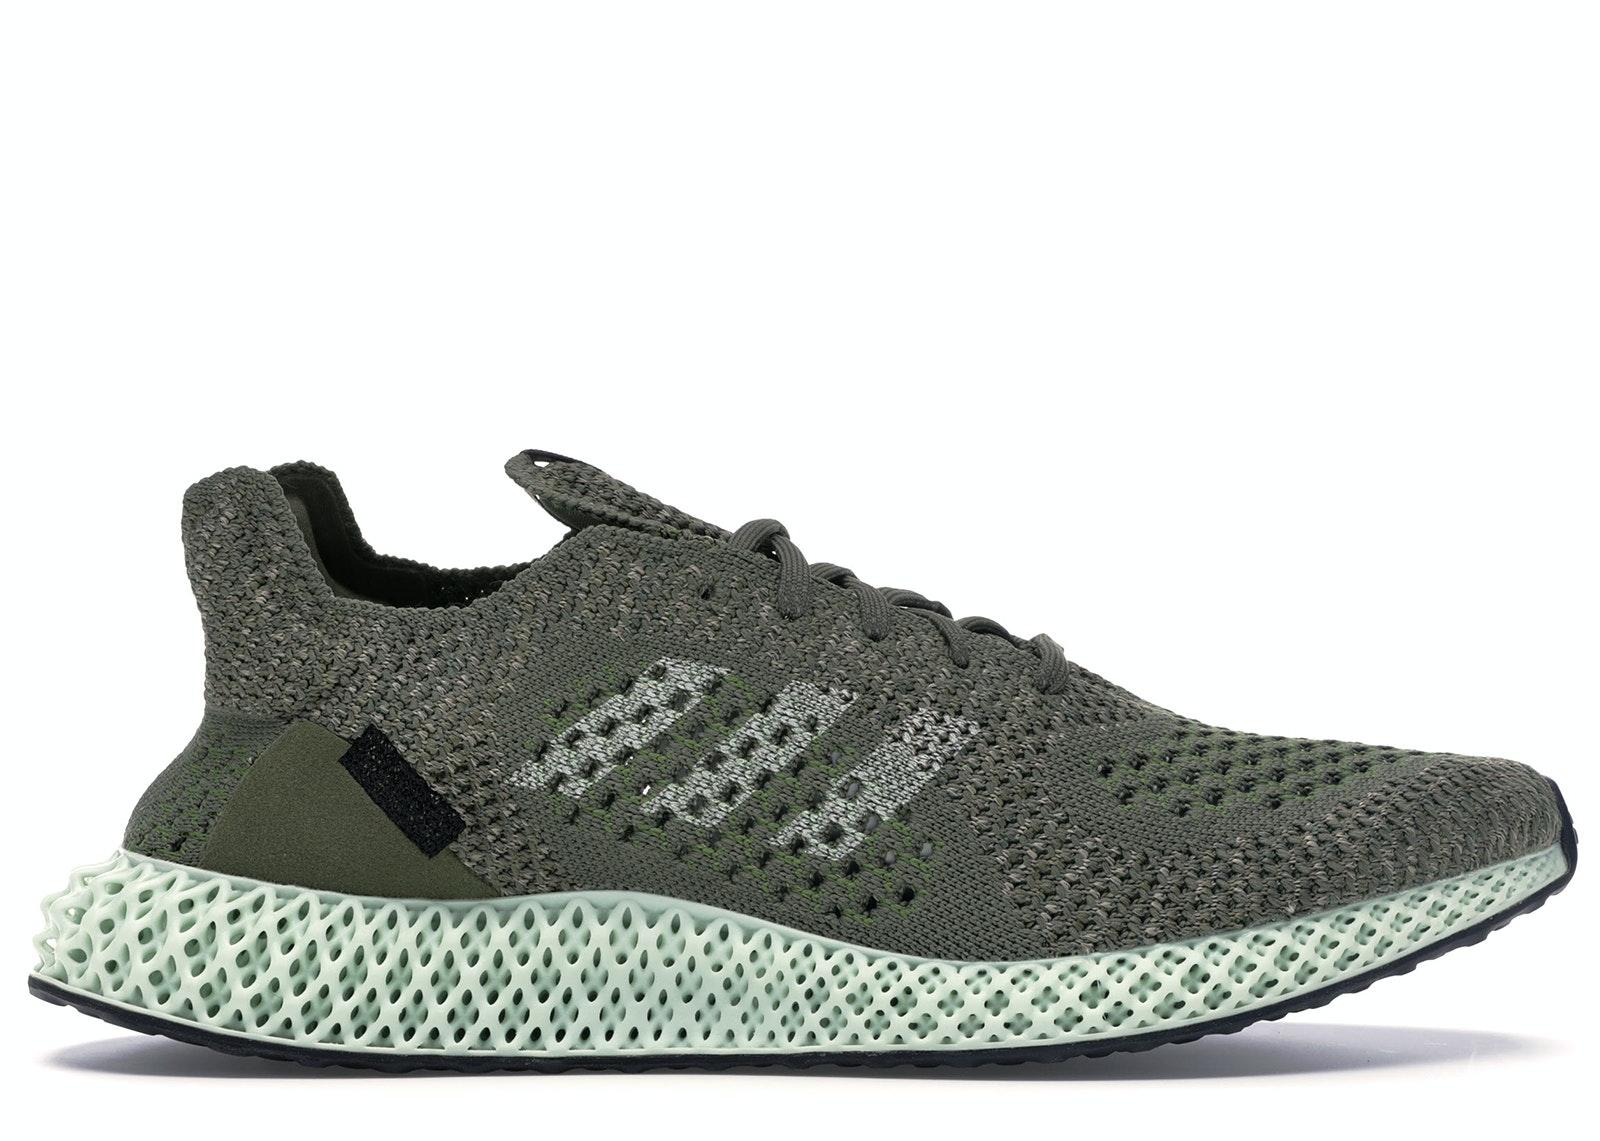 adidas Futurecraft 4D Footpatrol